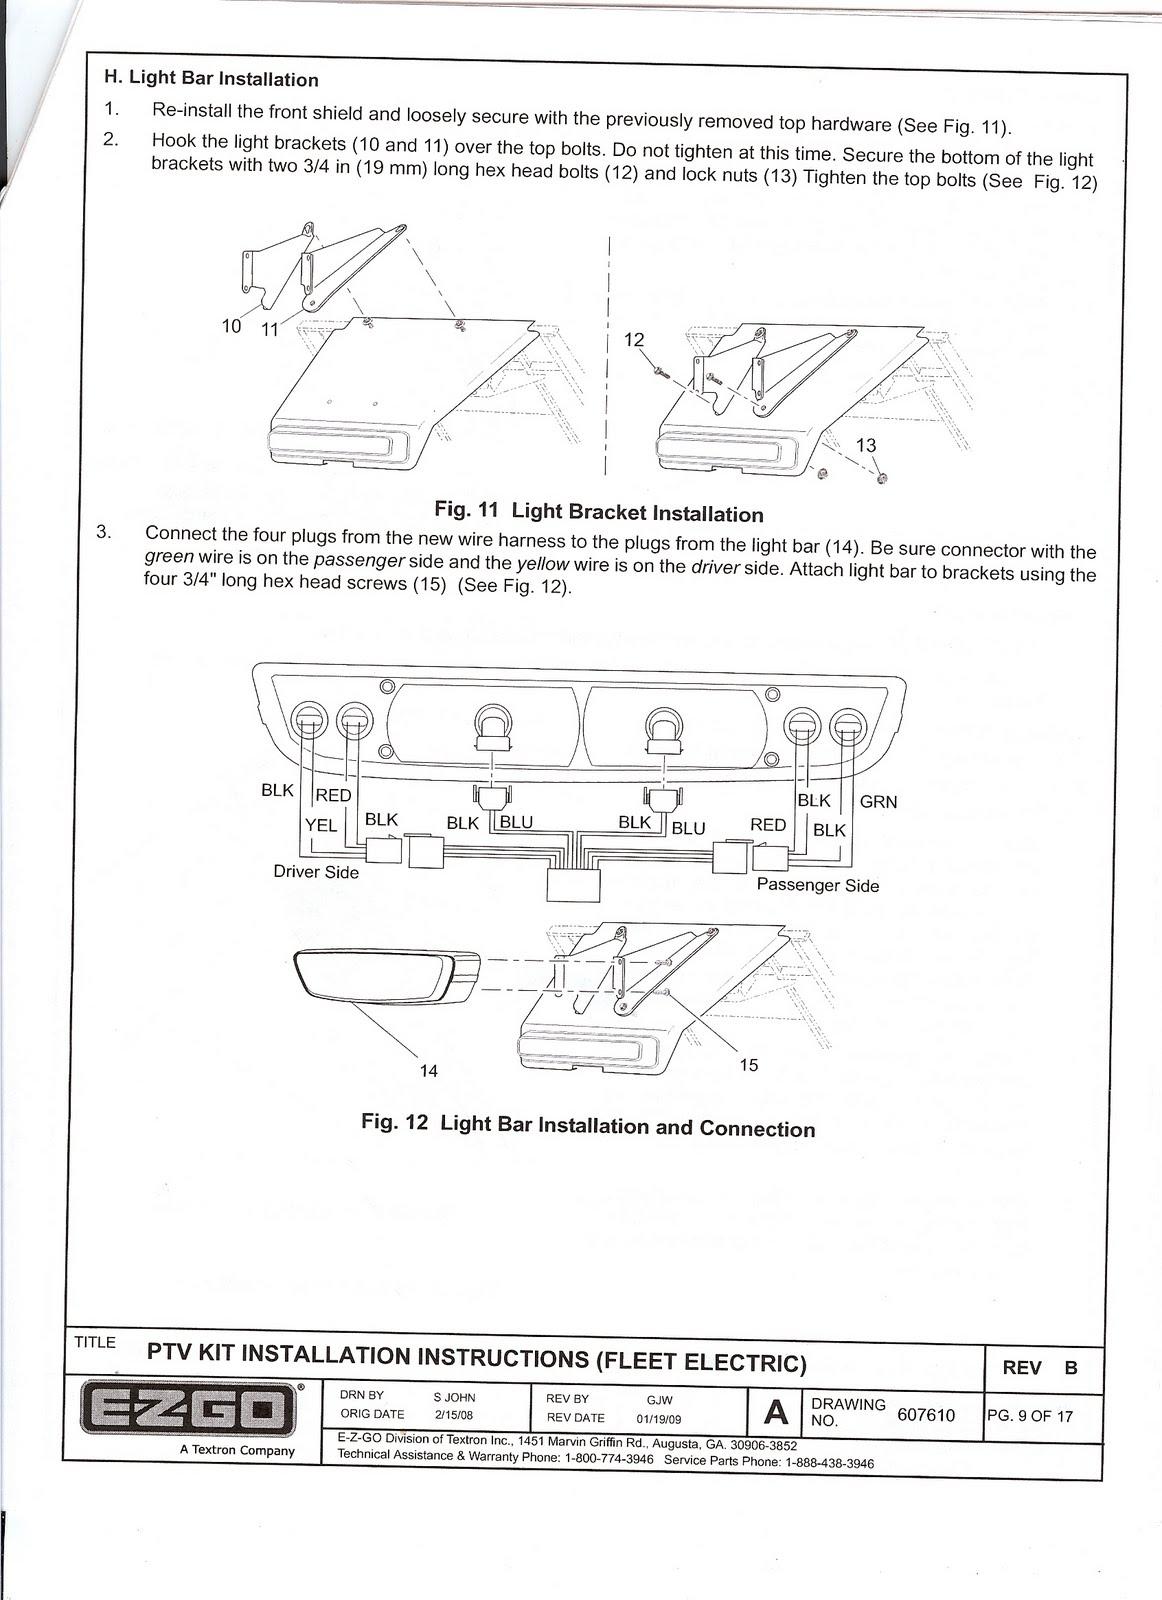 EZGO Freedom Light Kit Installation Instructions on westinghouse light kit wiring diagram, yamaha light kit wiring diagram, ezgo light kit installation, bad boy light kit wiring diagram,